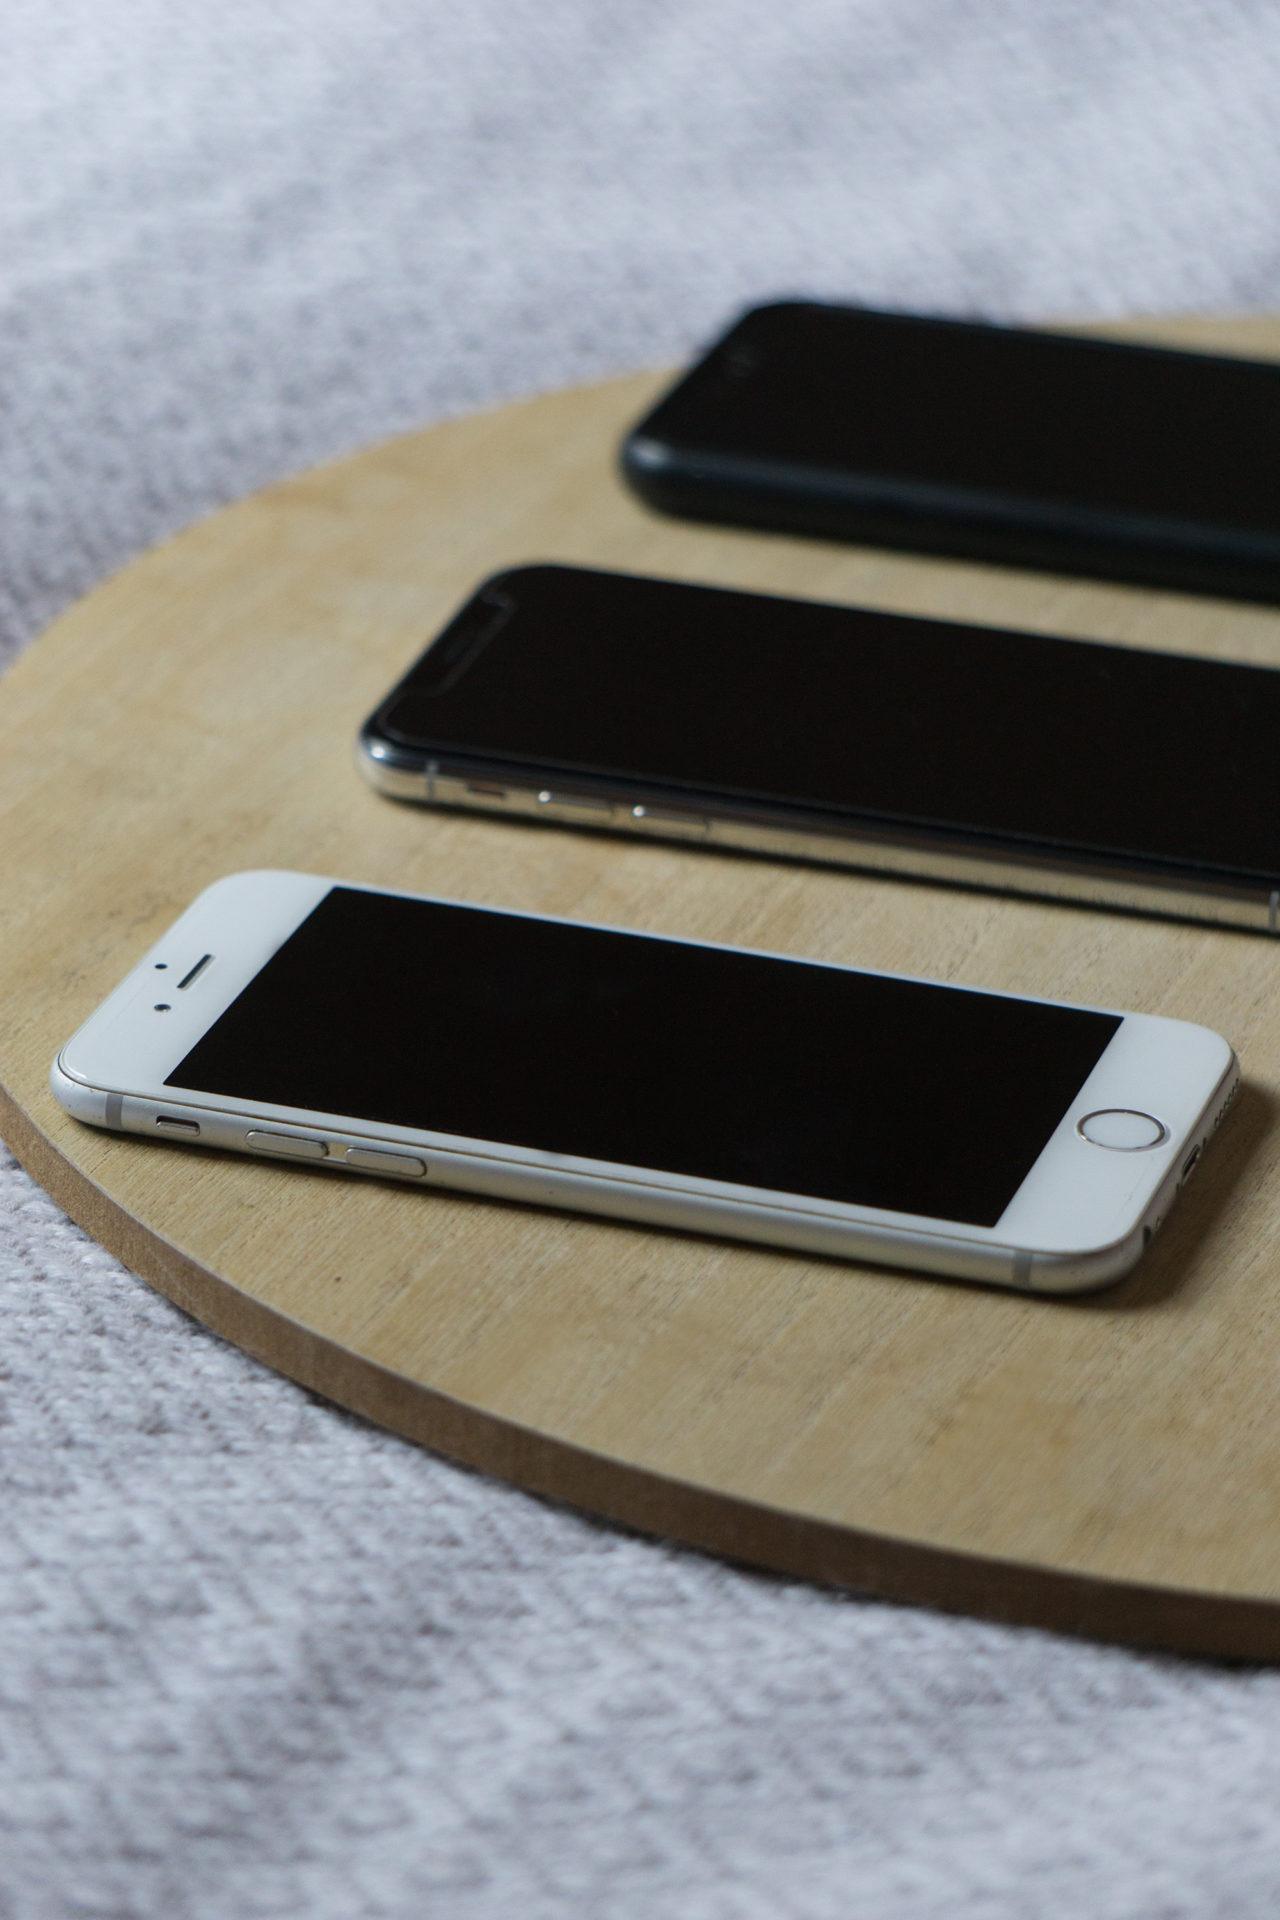 Refurbed Iphone